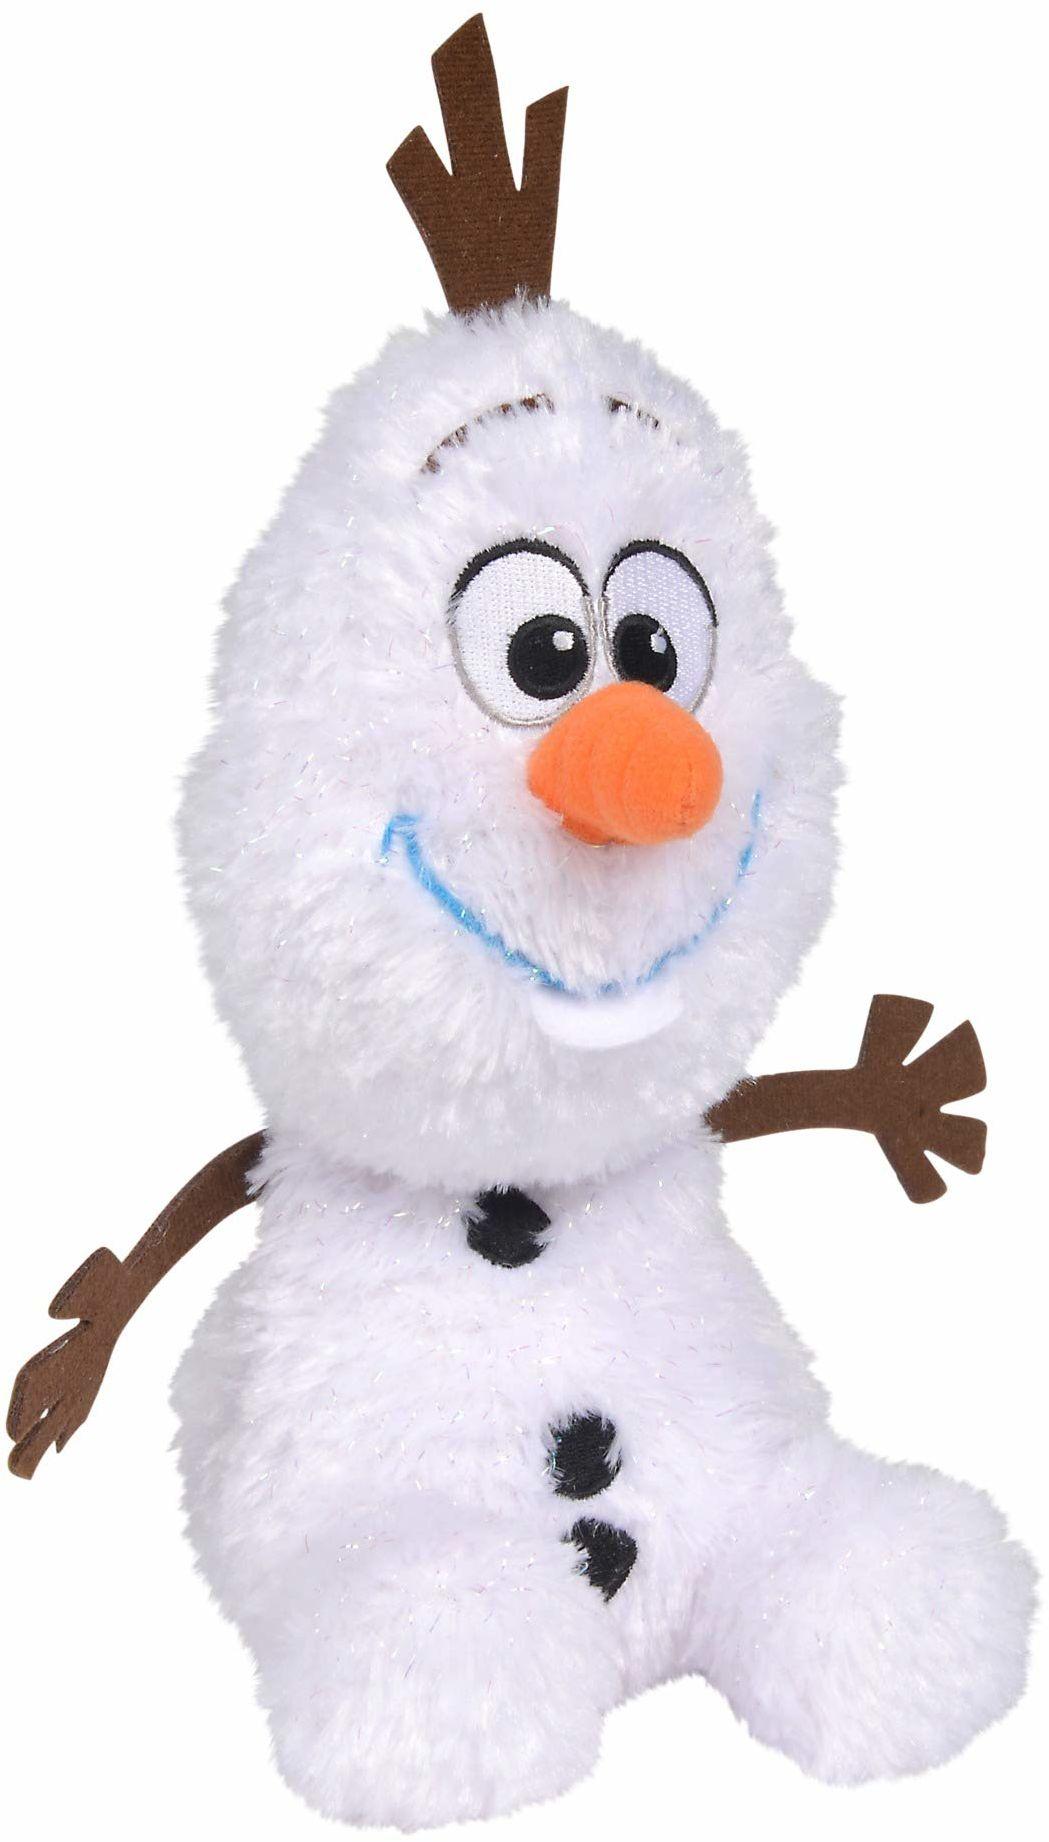 Simba 6315877641 Disney Frozen 2, Maskotka Olaf, 6315877641 25Cm